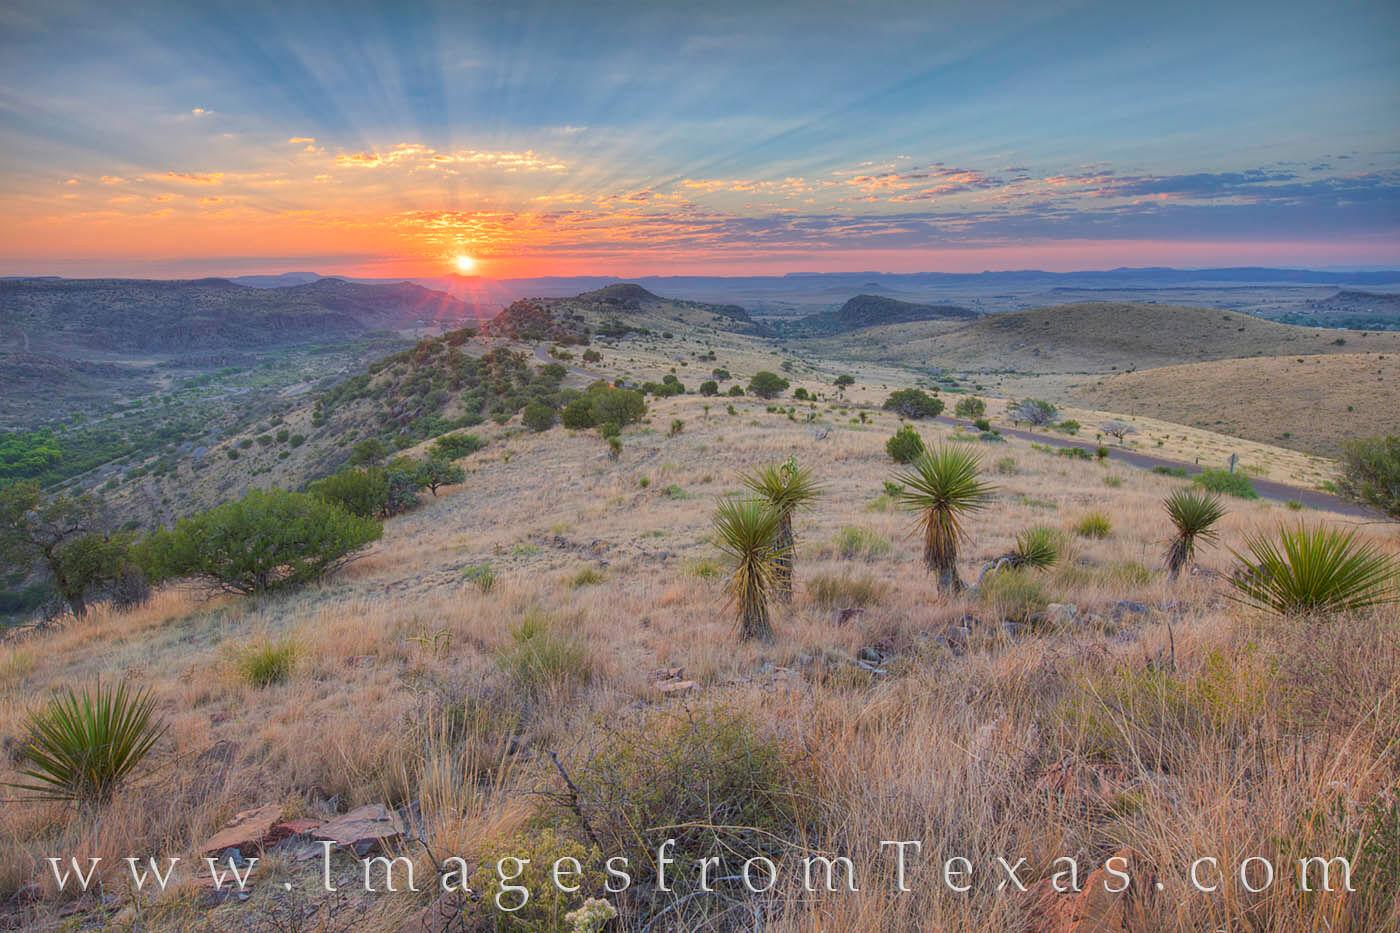 davis mountains, davis mountains state park, fort davis, skyline drive trail, texas state parks, sunrise, texas sunrise, texas hikes, texas landscapes, photo